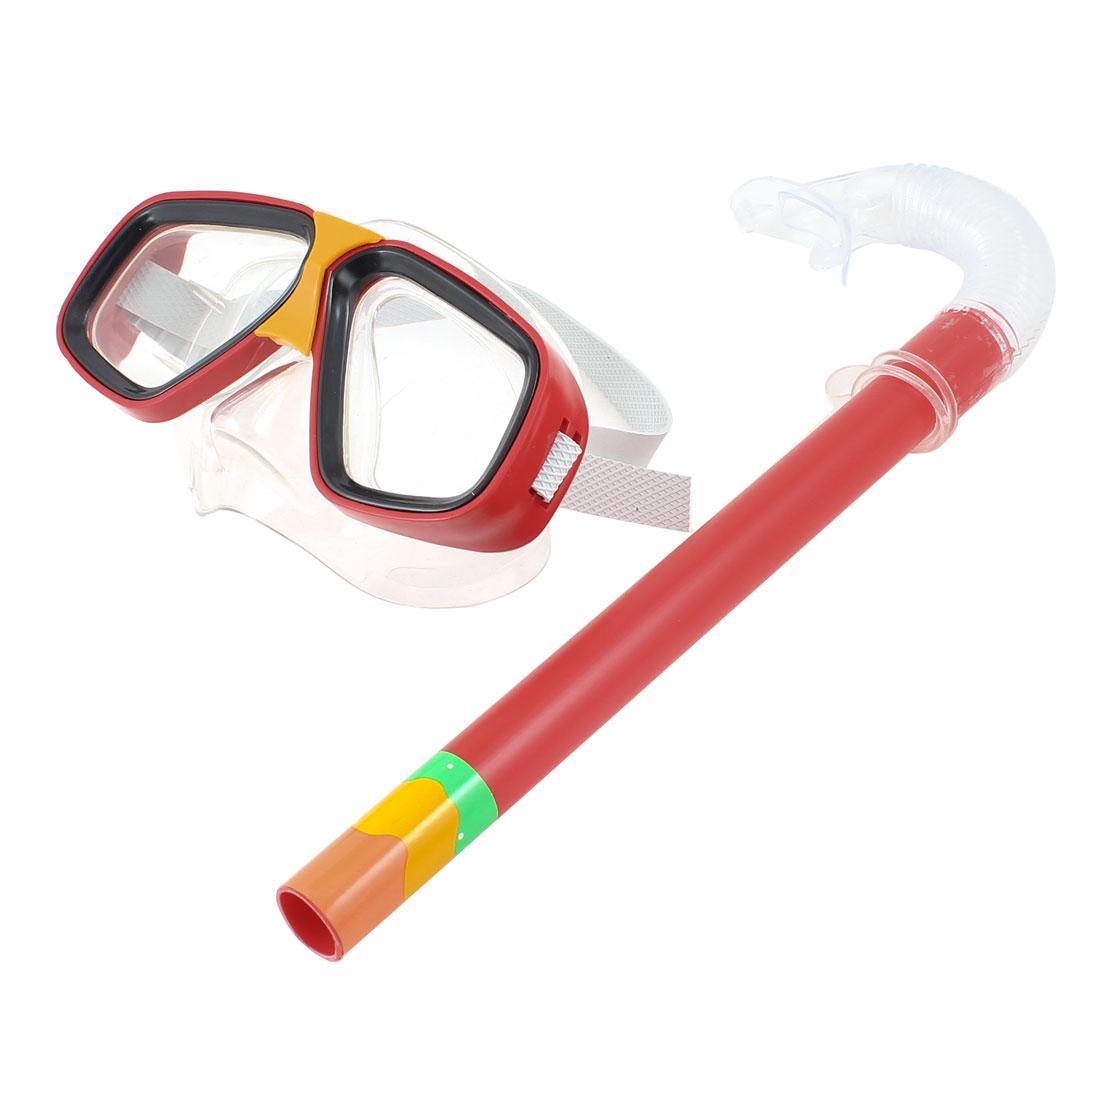 Red Clear PVC Frame Rubber Strap Swim Diving Scuba Goggles Mask Snorkel Set